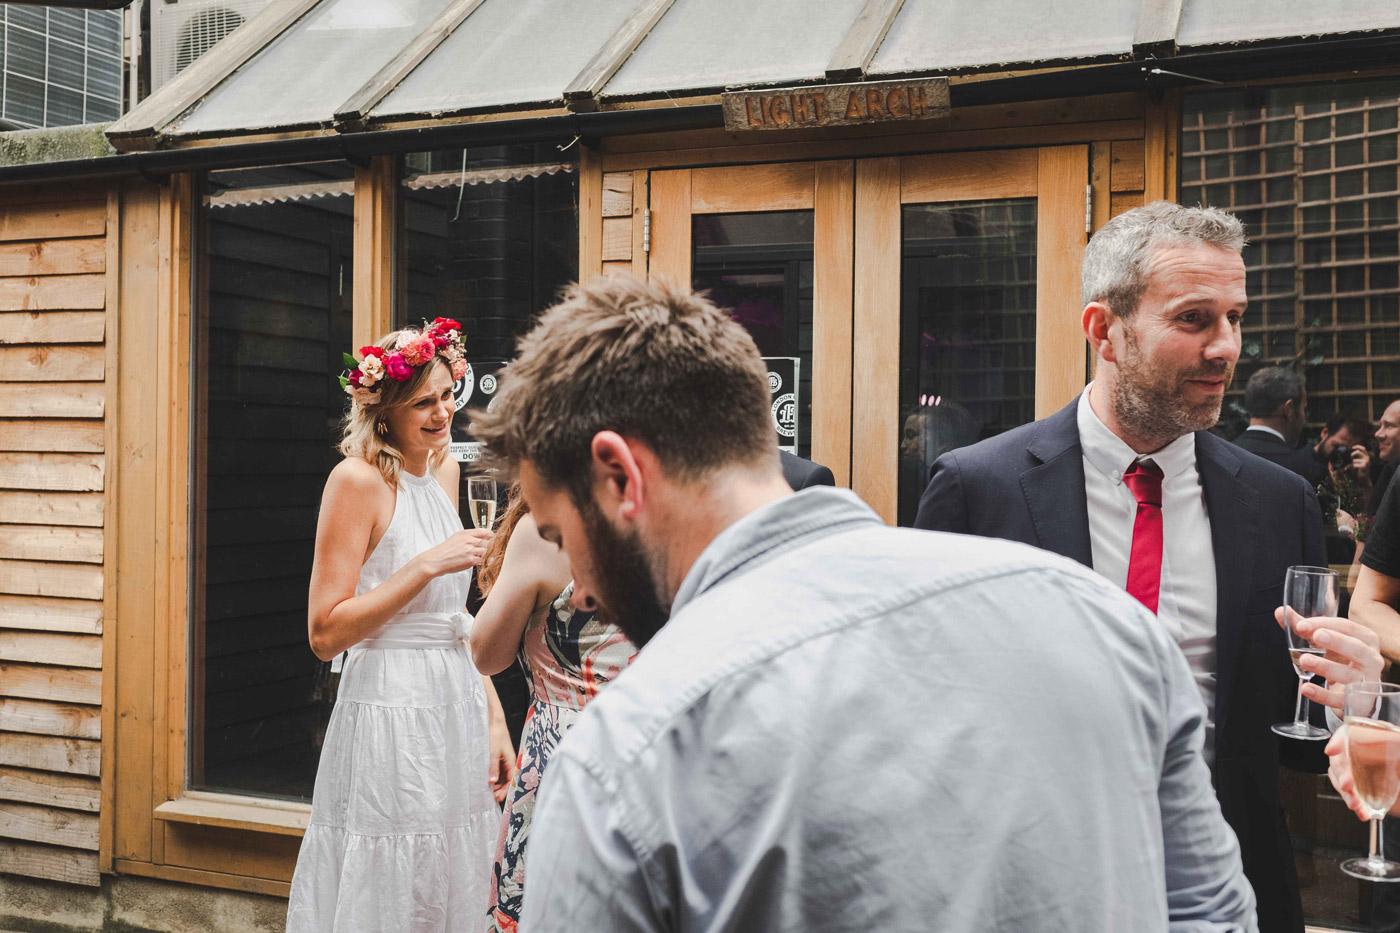 hackney wedding at London fields brewery